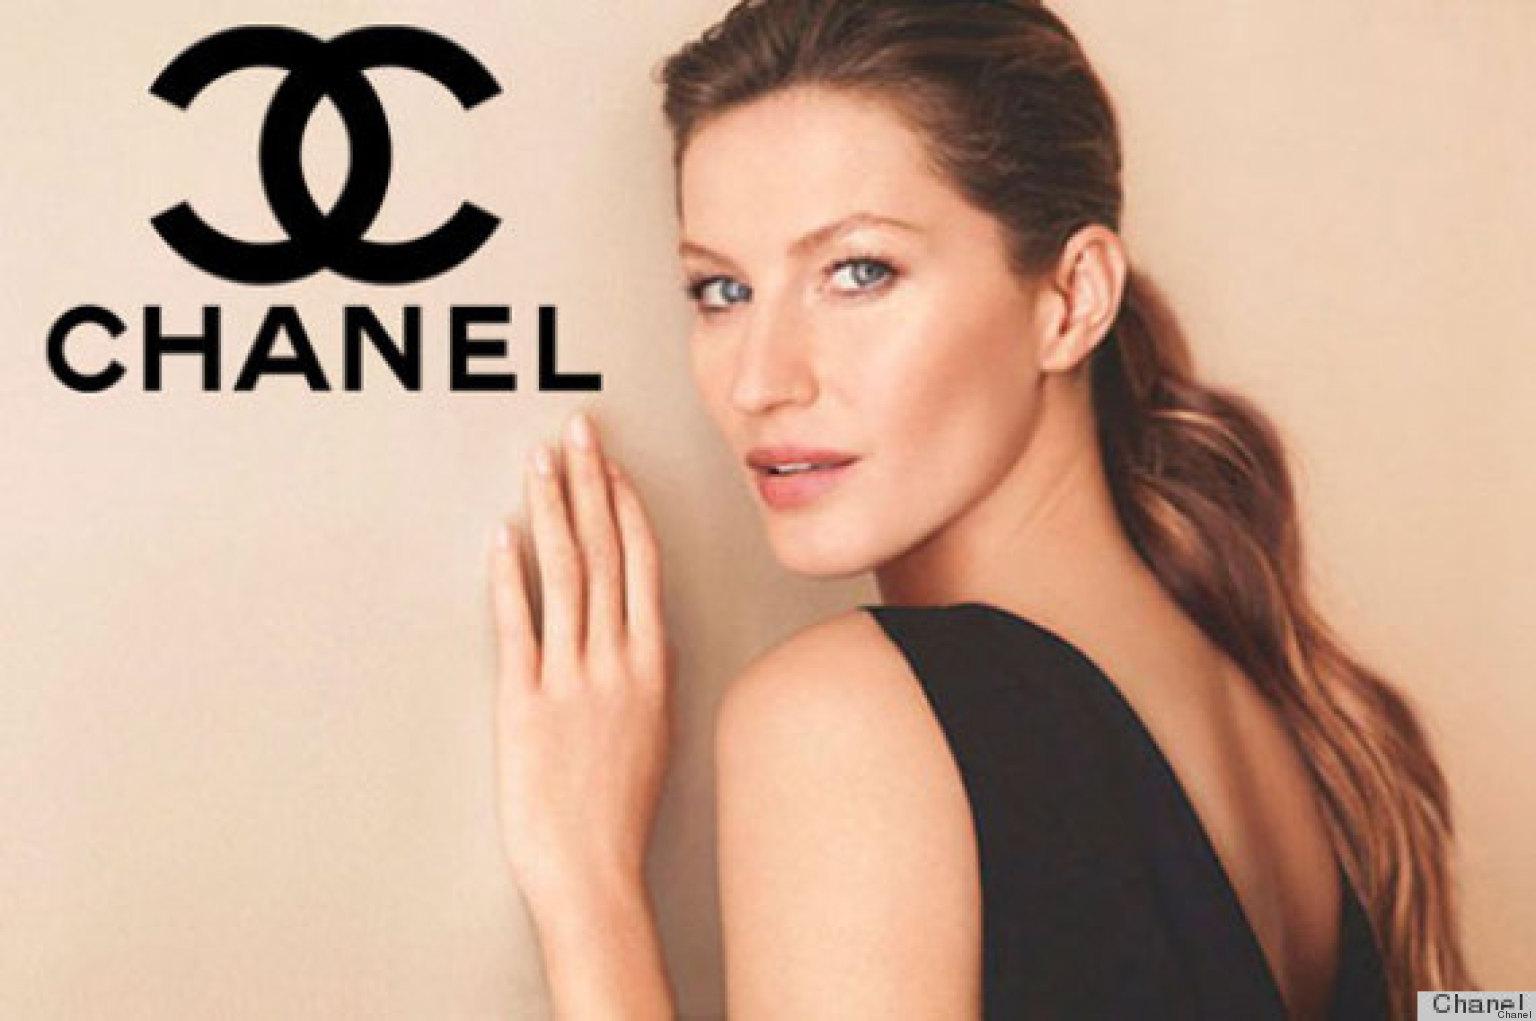 Gisele Bundchen Is The New Face Of Chanel Cosmetics (PHOTOS): www.huffingtonpost.com/2013/02/04/gisele-bundchen-chanel-makeup...